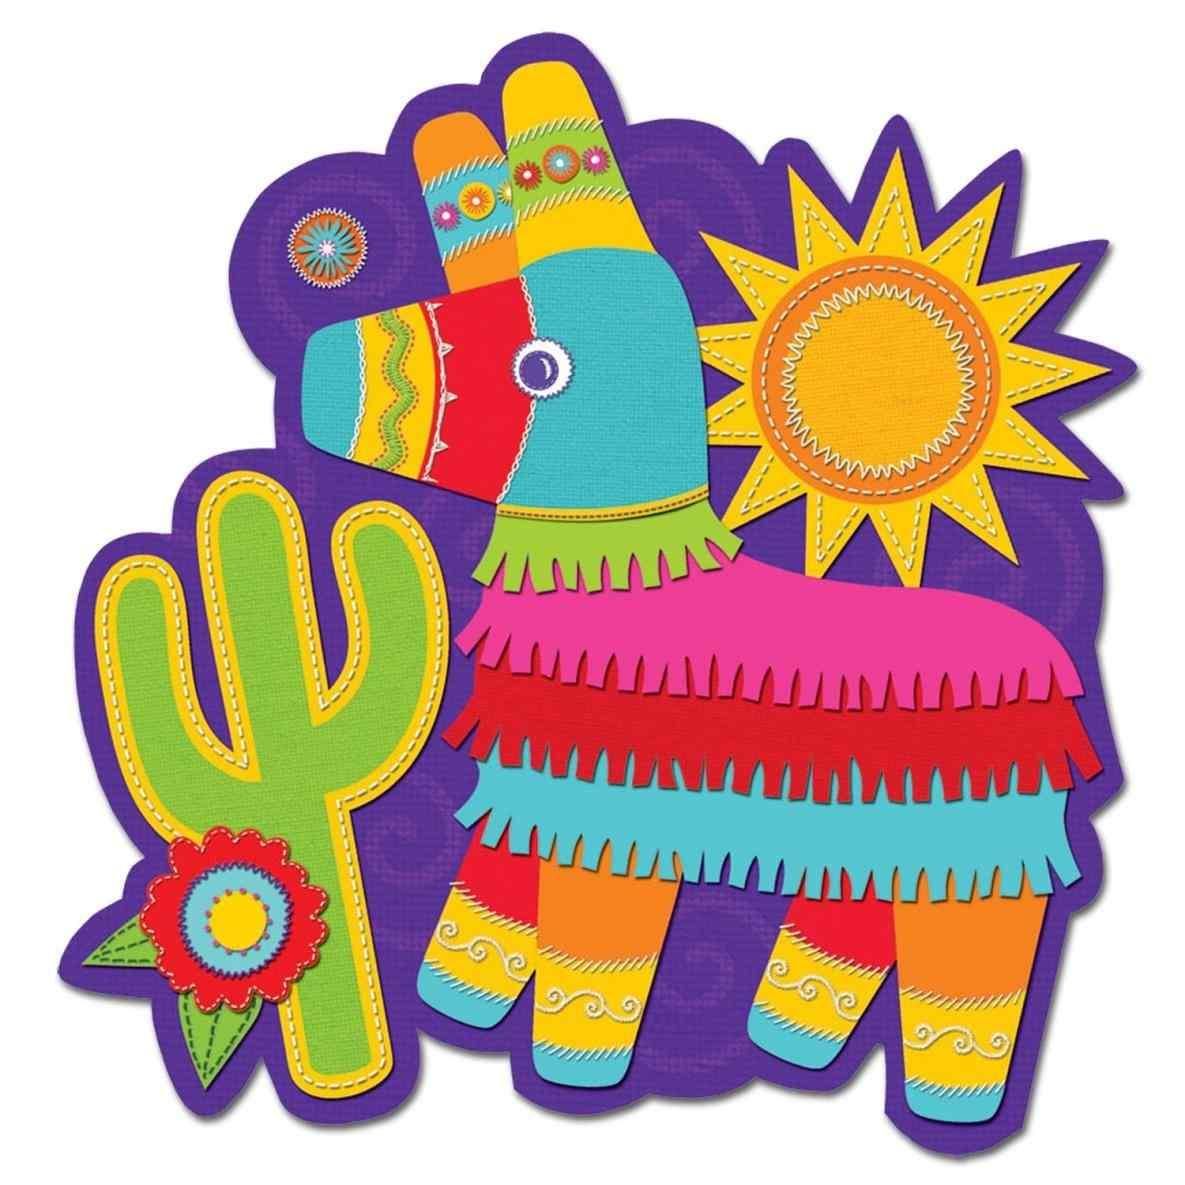 1185x1185 Fiesta Mexican Party Decorations Clipart Border Clip Art Village